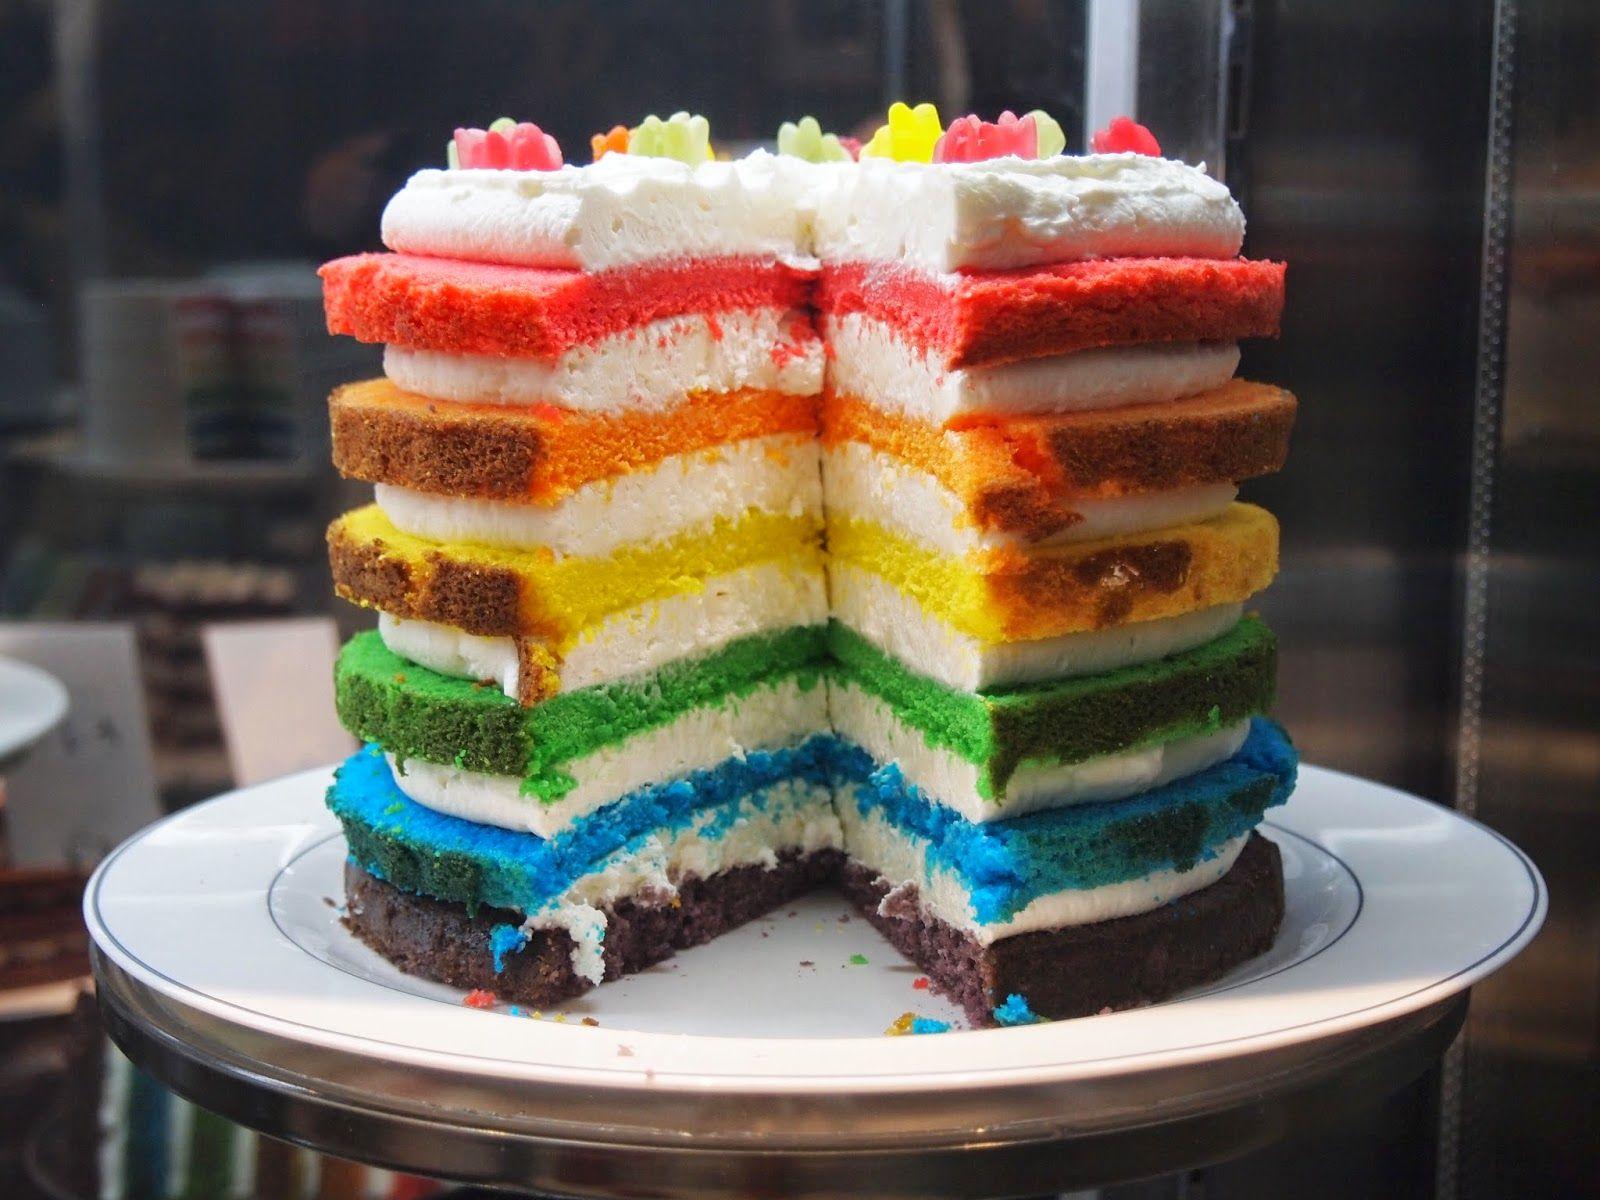 Dore dore a sinsa cafe that takes the cake seoul